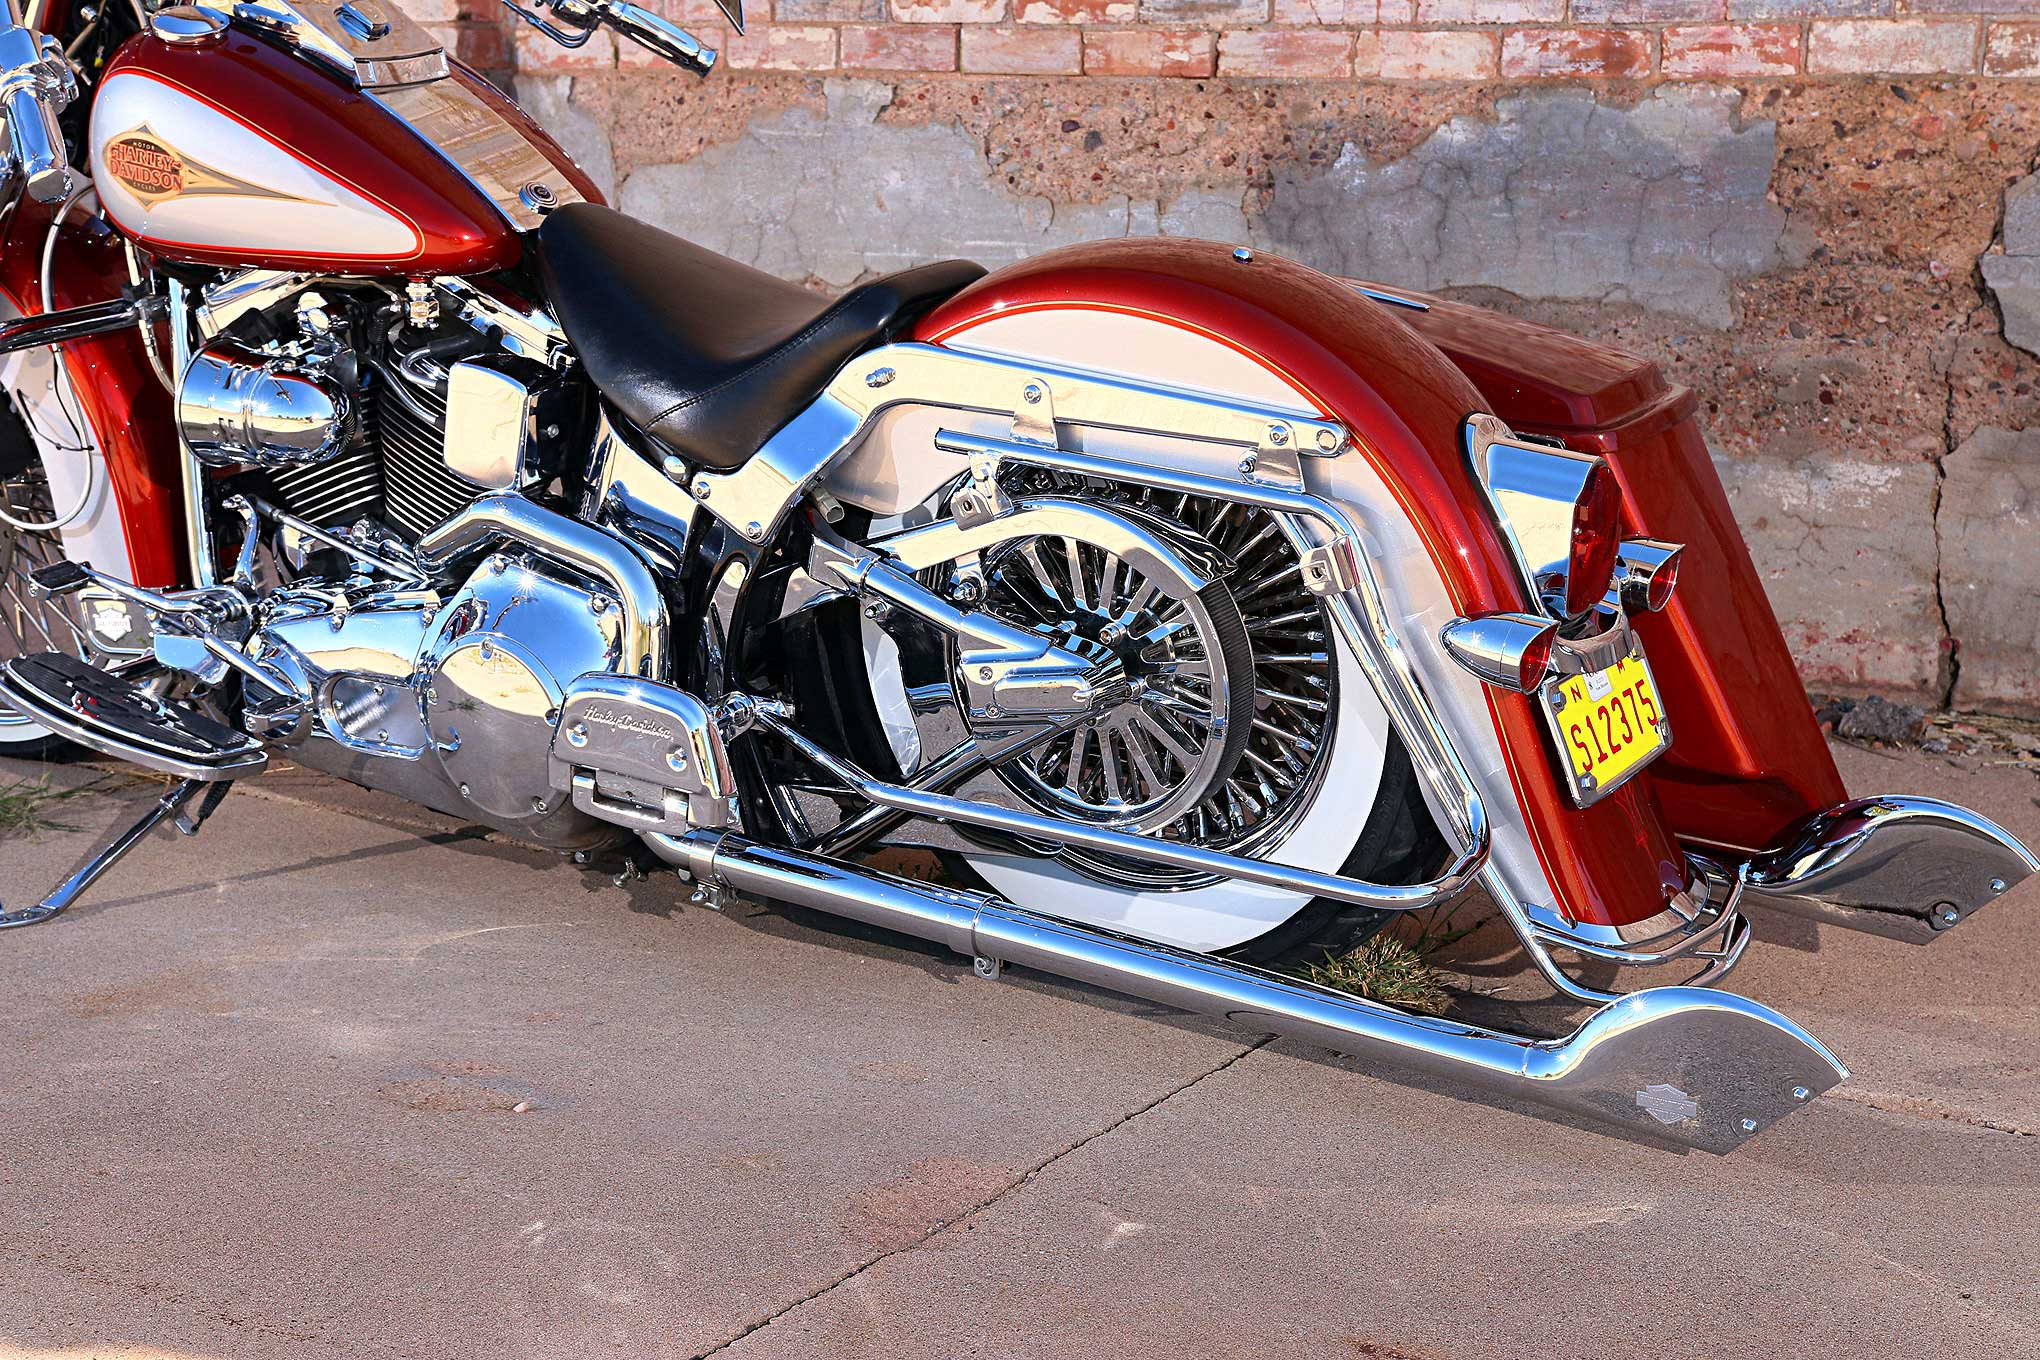 1999 Harley-Davidson Heritage Softail - Ride of Passage